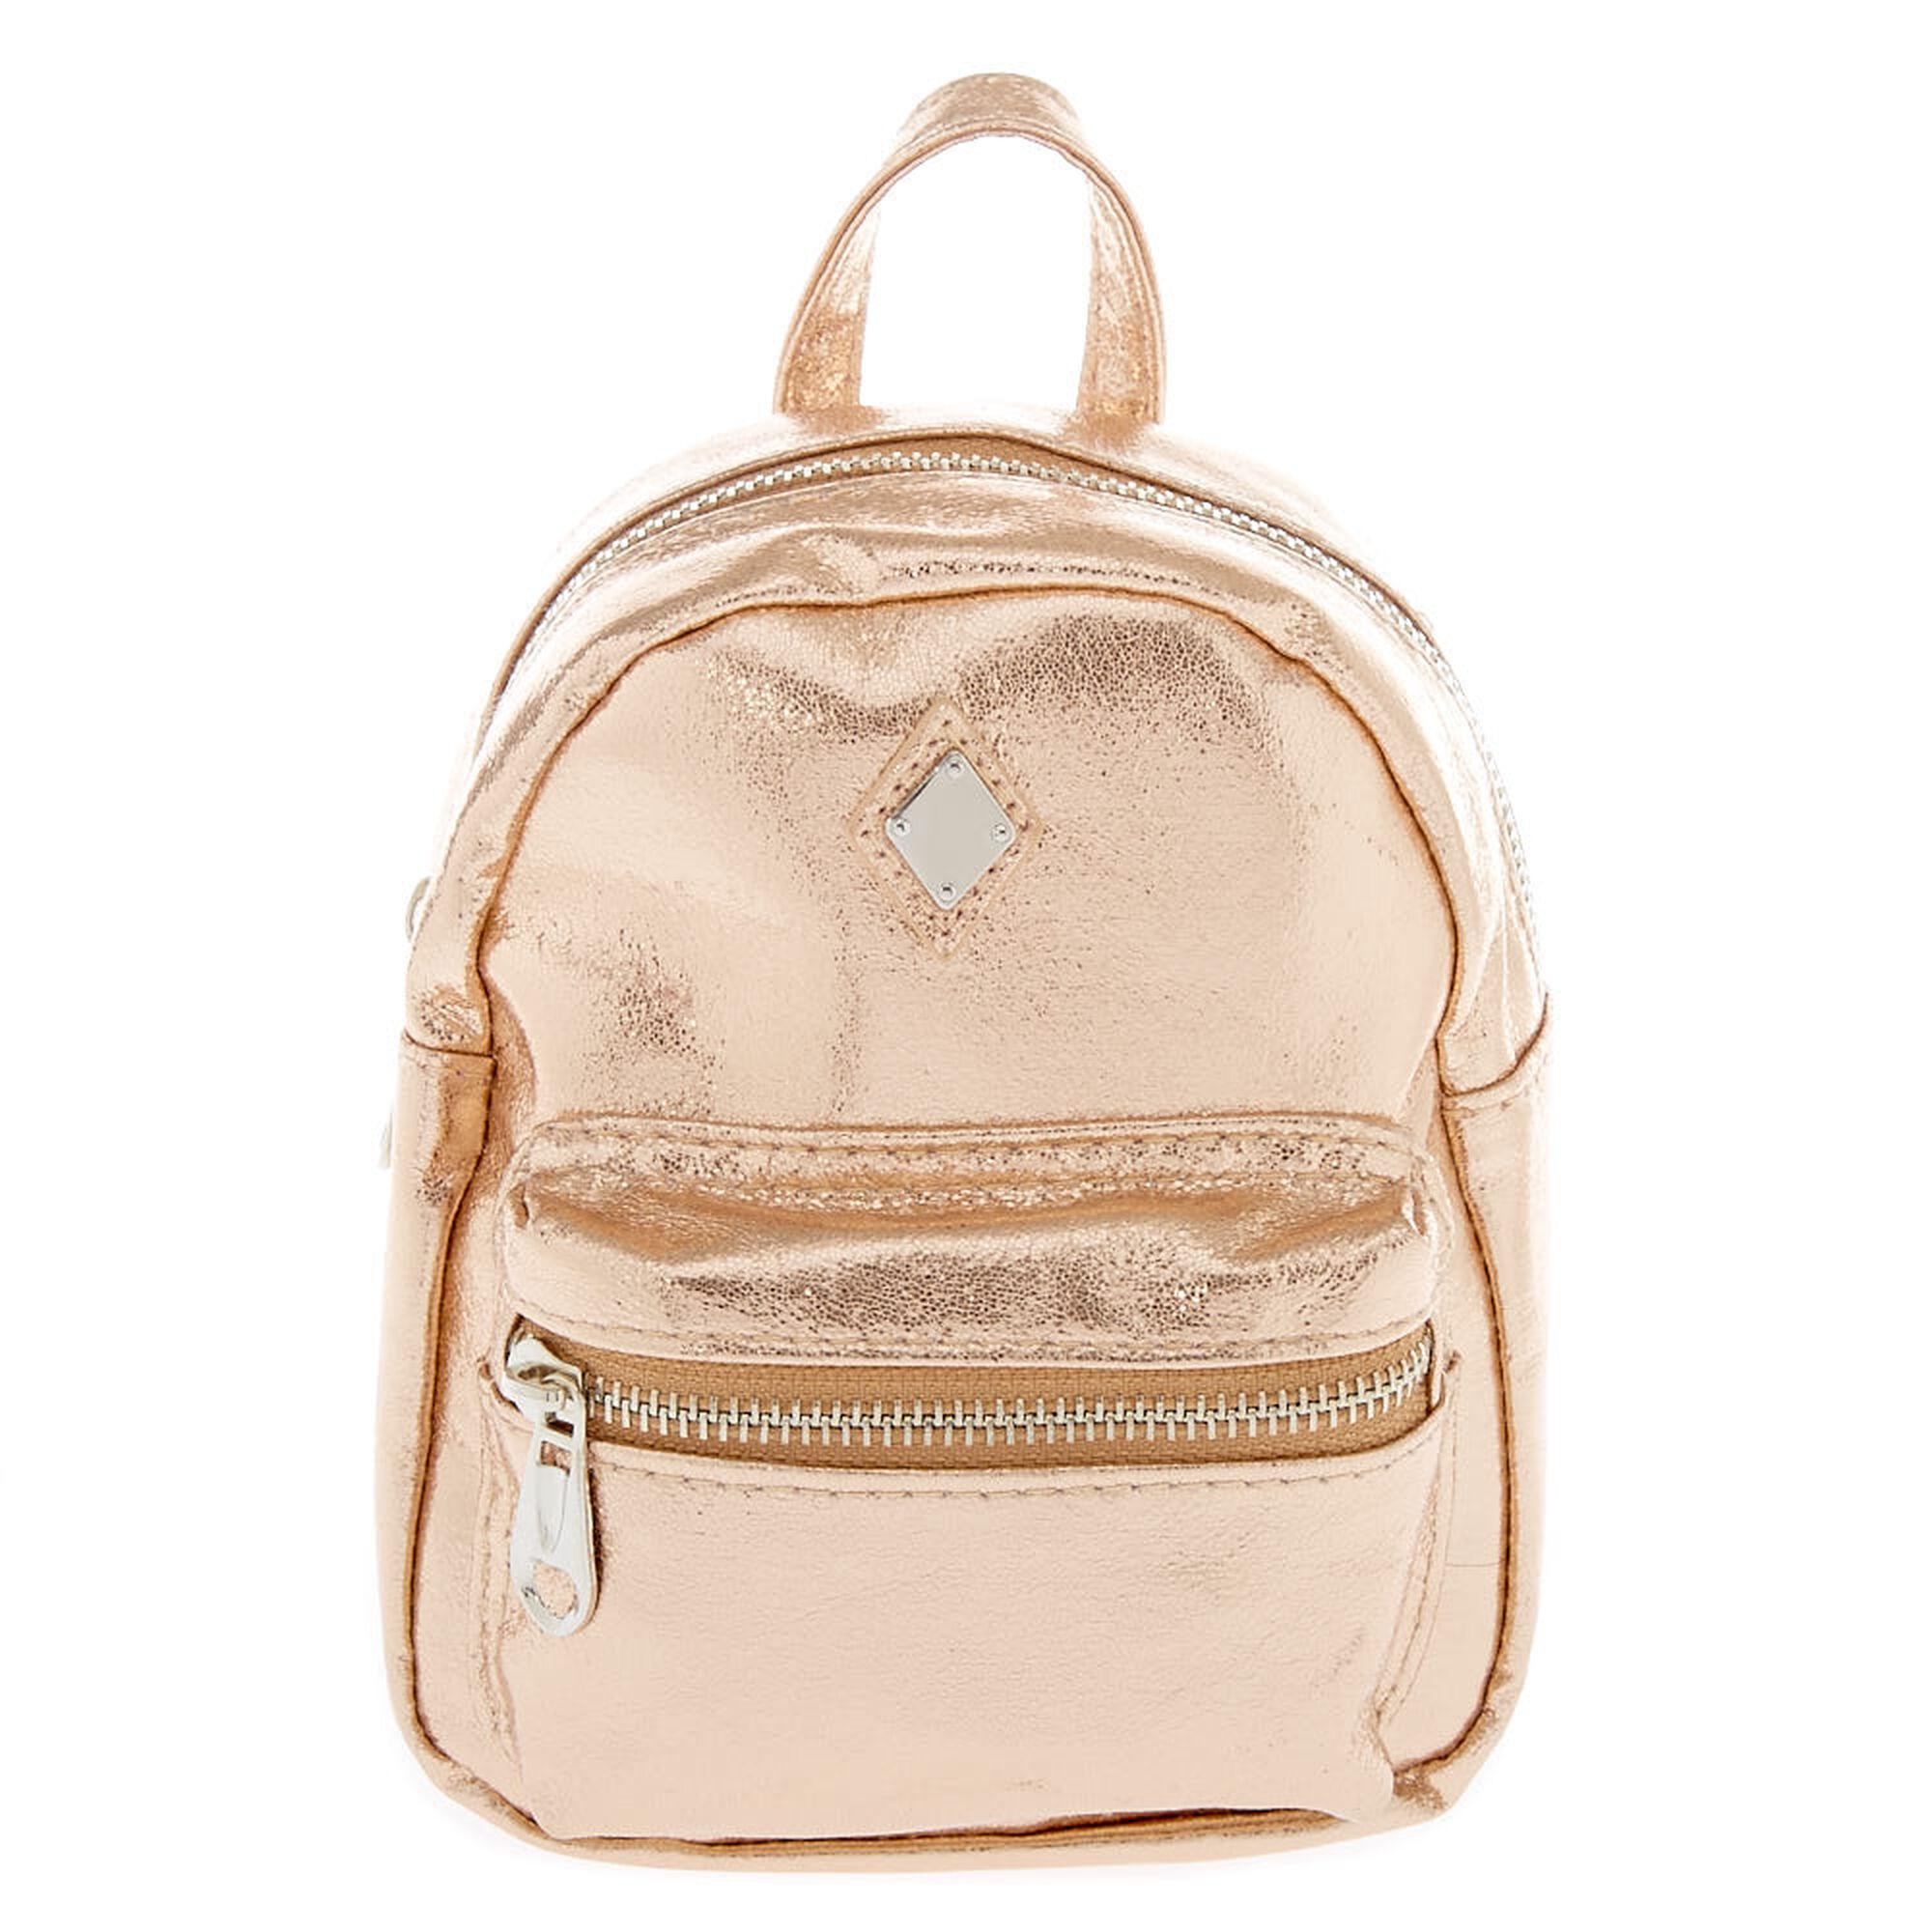 804f7c66c2 Metallic Rose Gold Mini Backpack